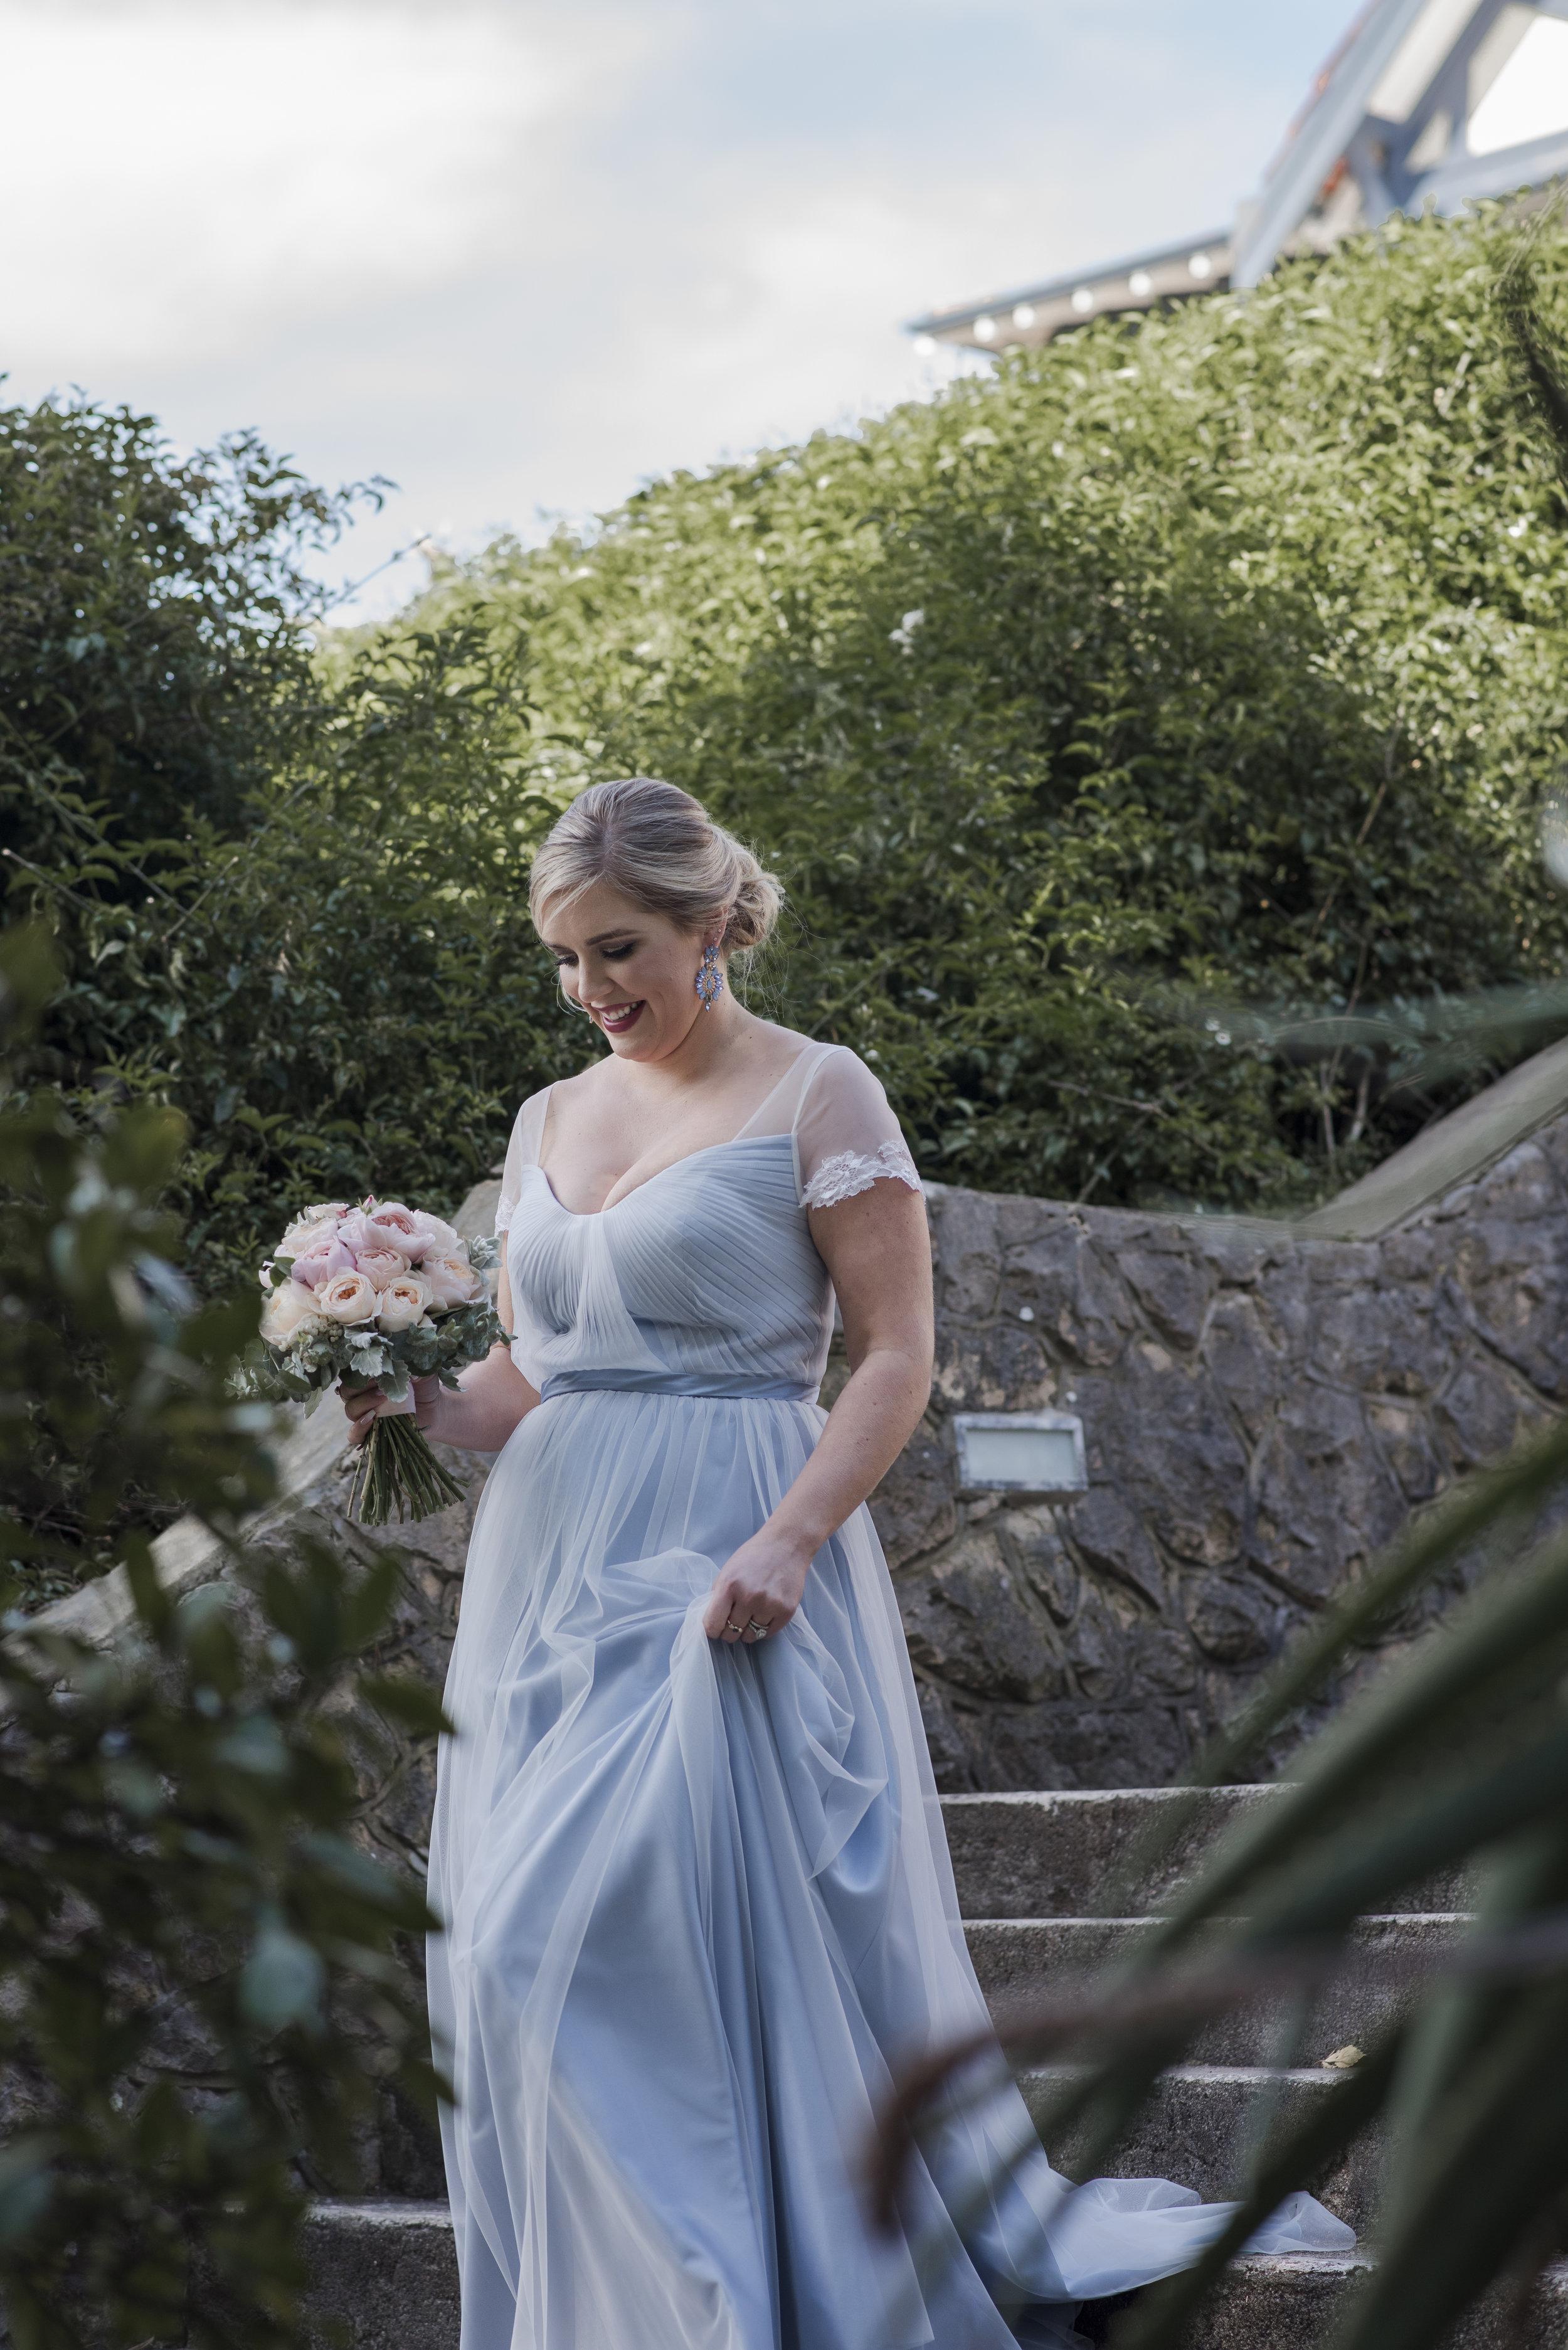 Teagan_Mayflower Weddings Photography_012.jpg